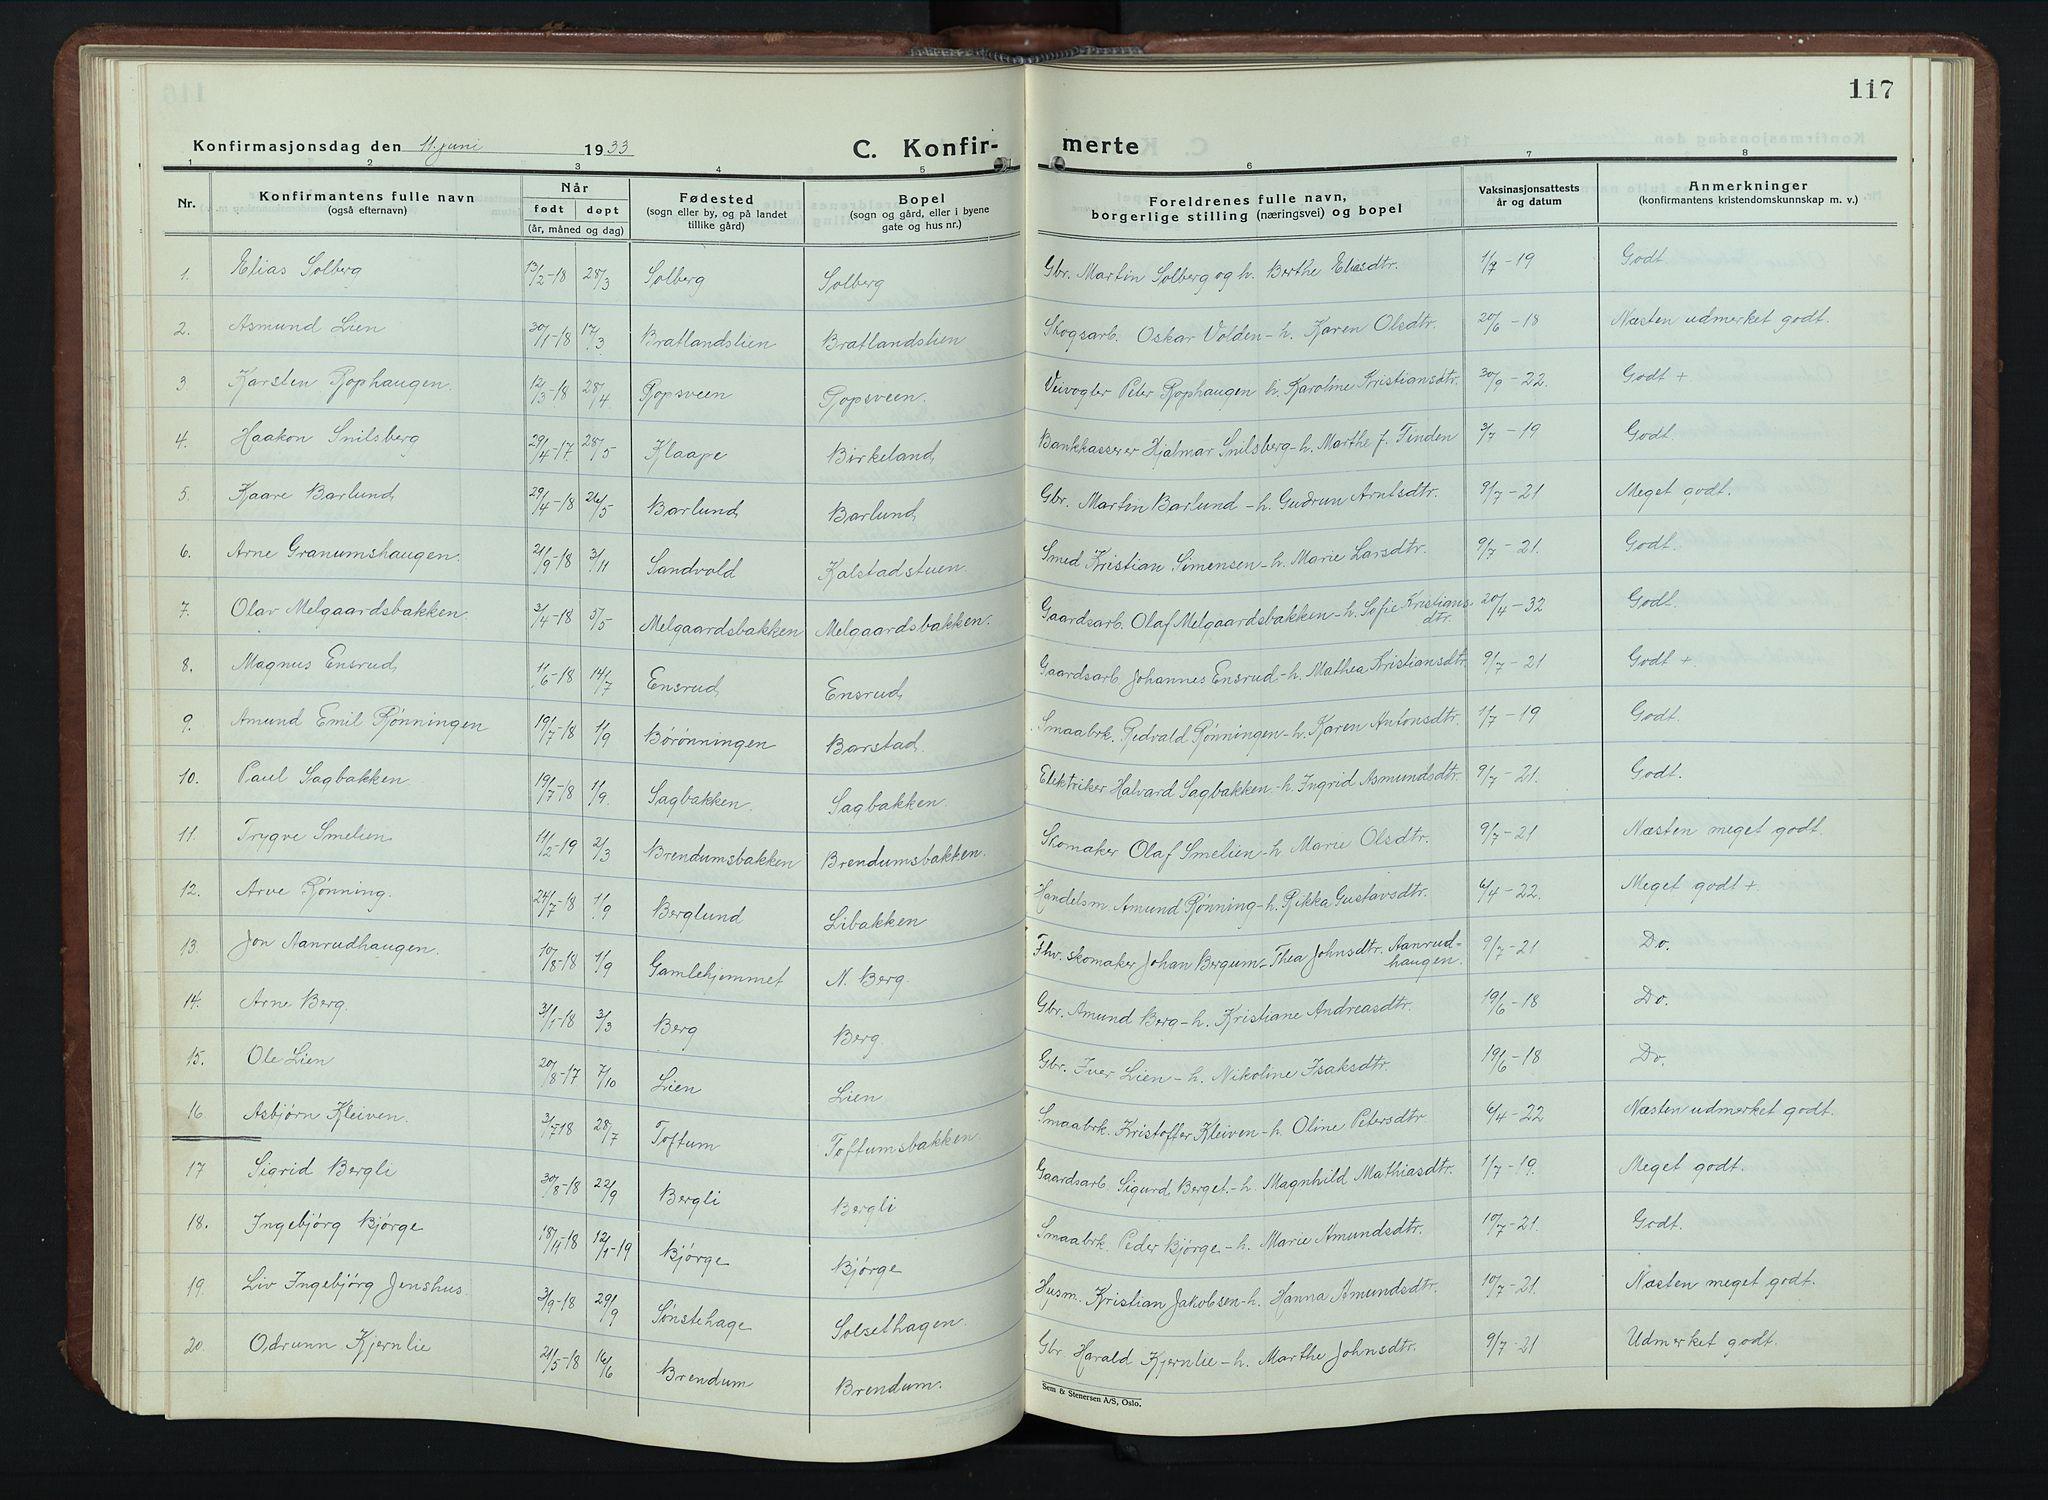 SAH, Vestre Gausdal prestekontor, Klokkerbok nr. 5, 1926-1955, s. 117